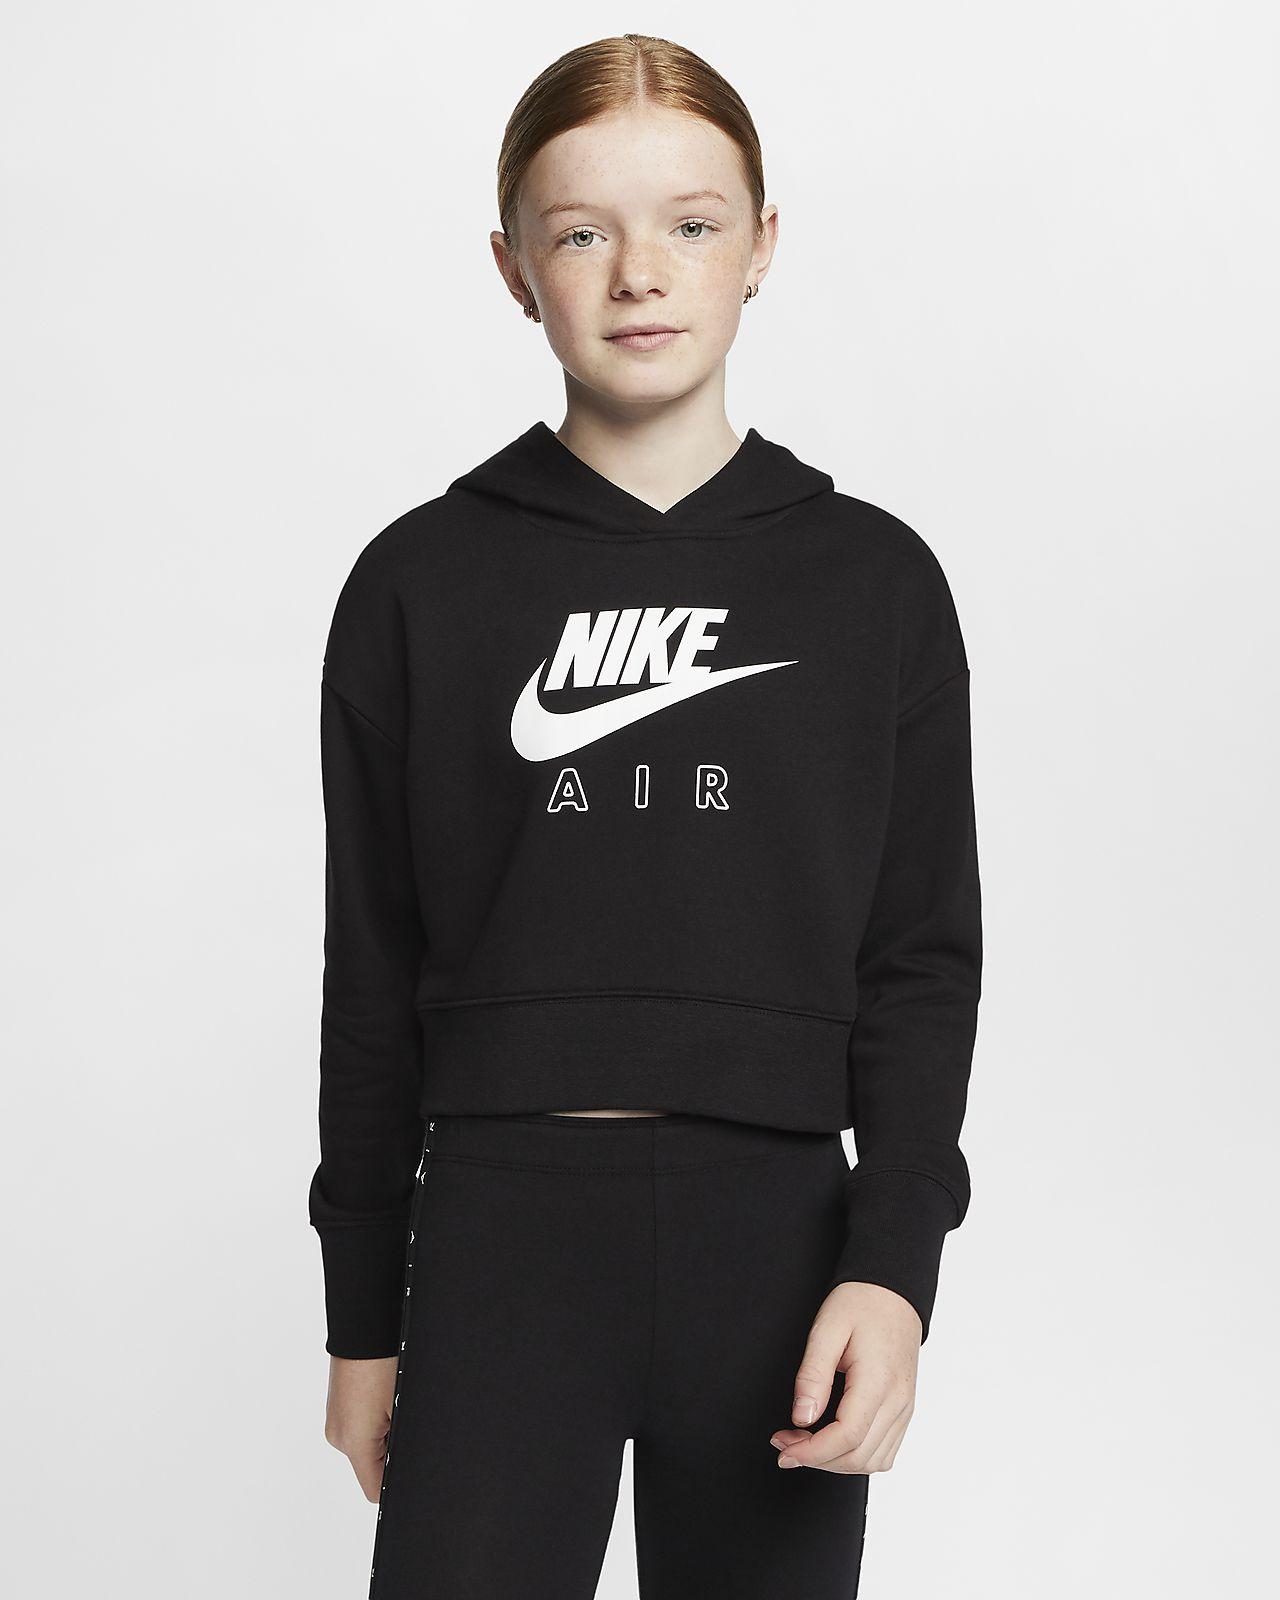 Nike Air Sudadera con capucha corta de tejido French Terry - Niña